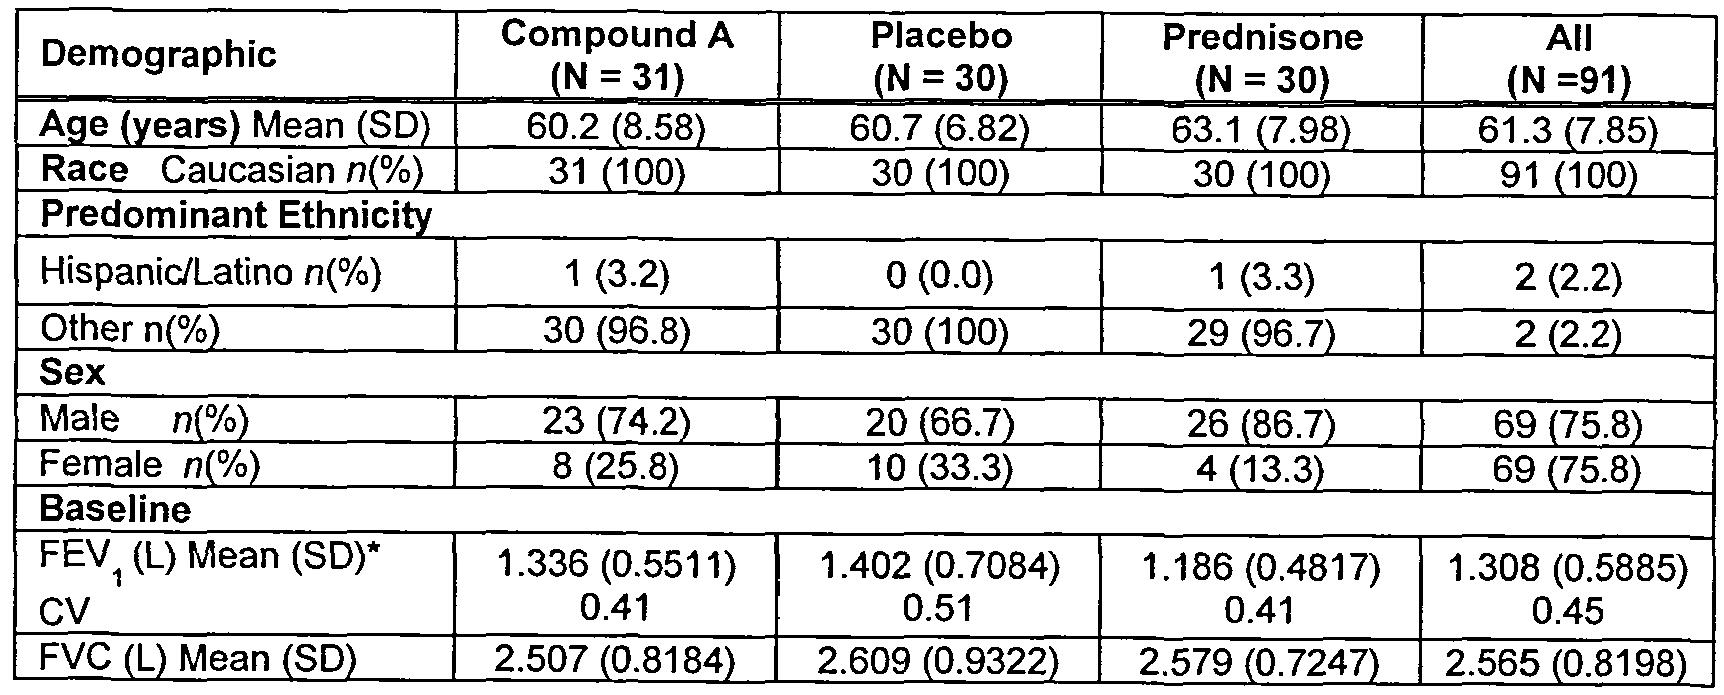 best price for fluconazole generic diflucan